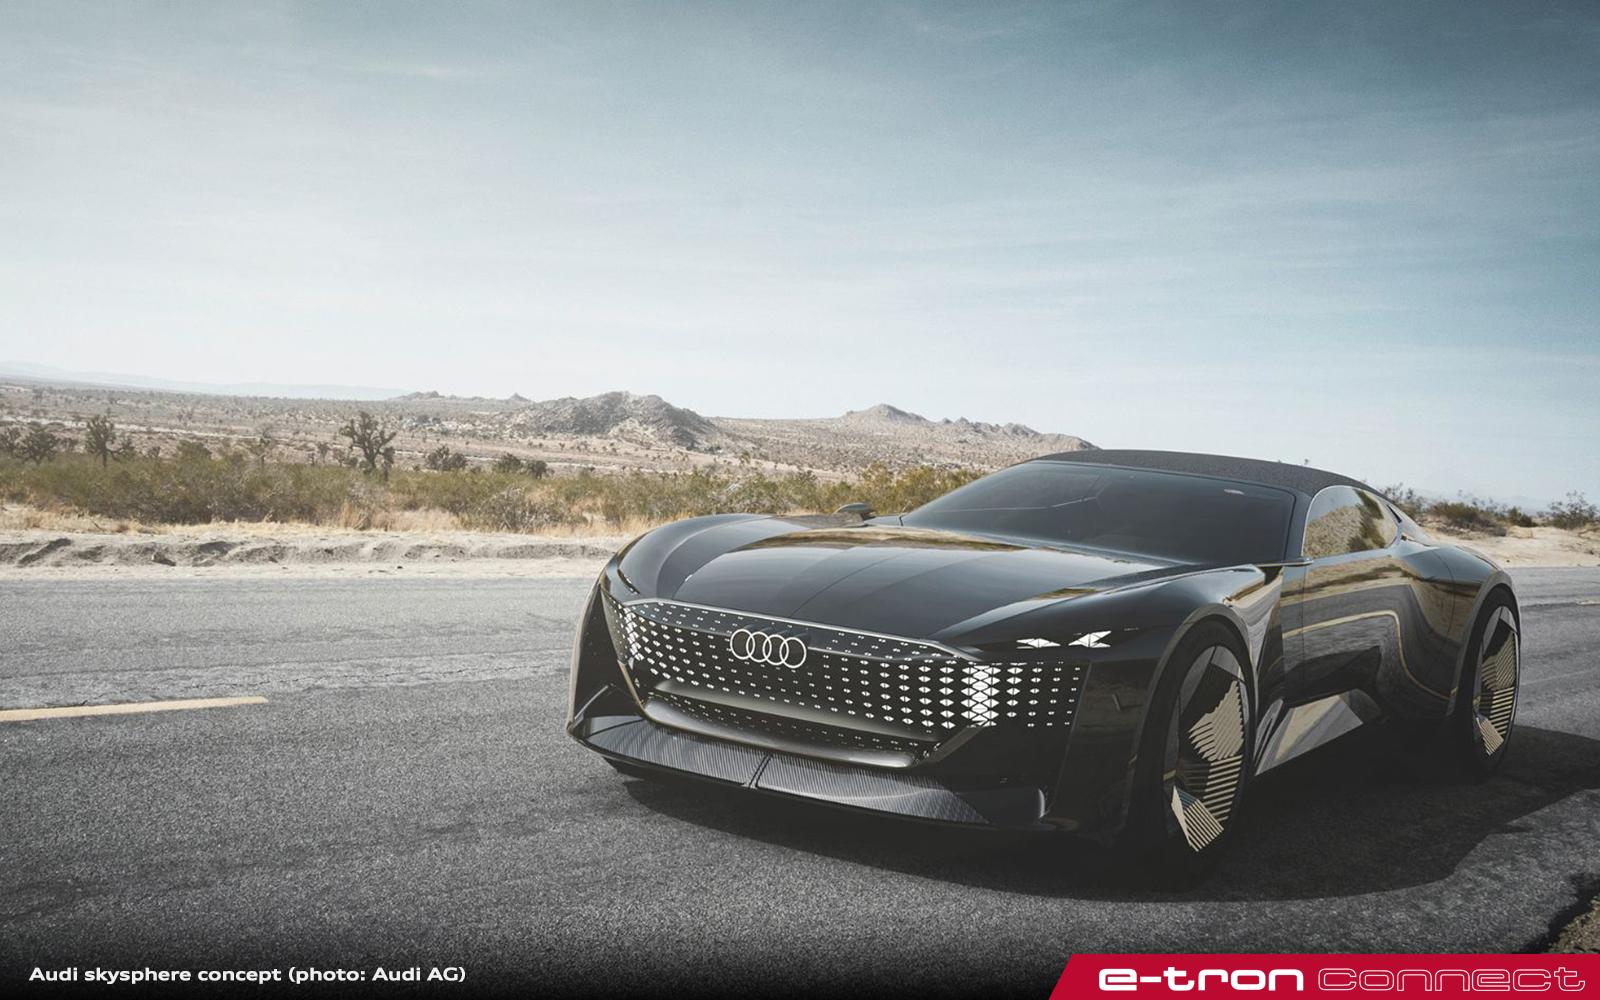 Audi skysphere concept – The Future Is Wide Open